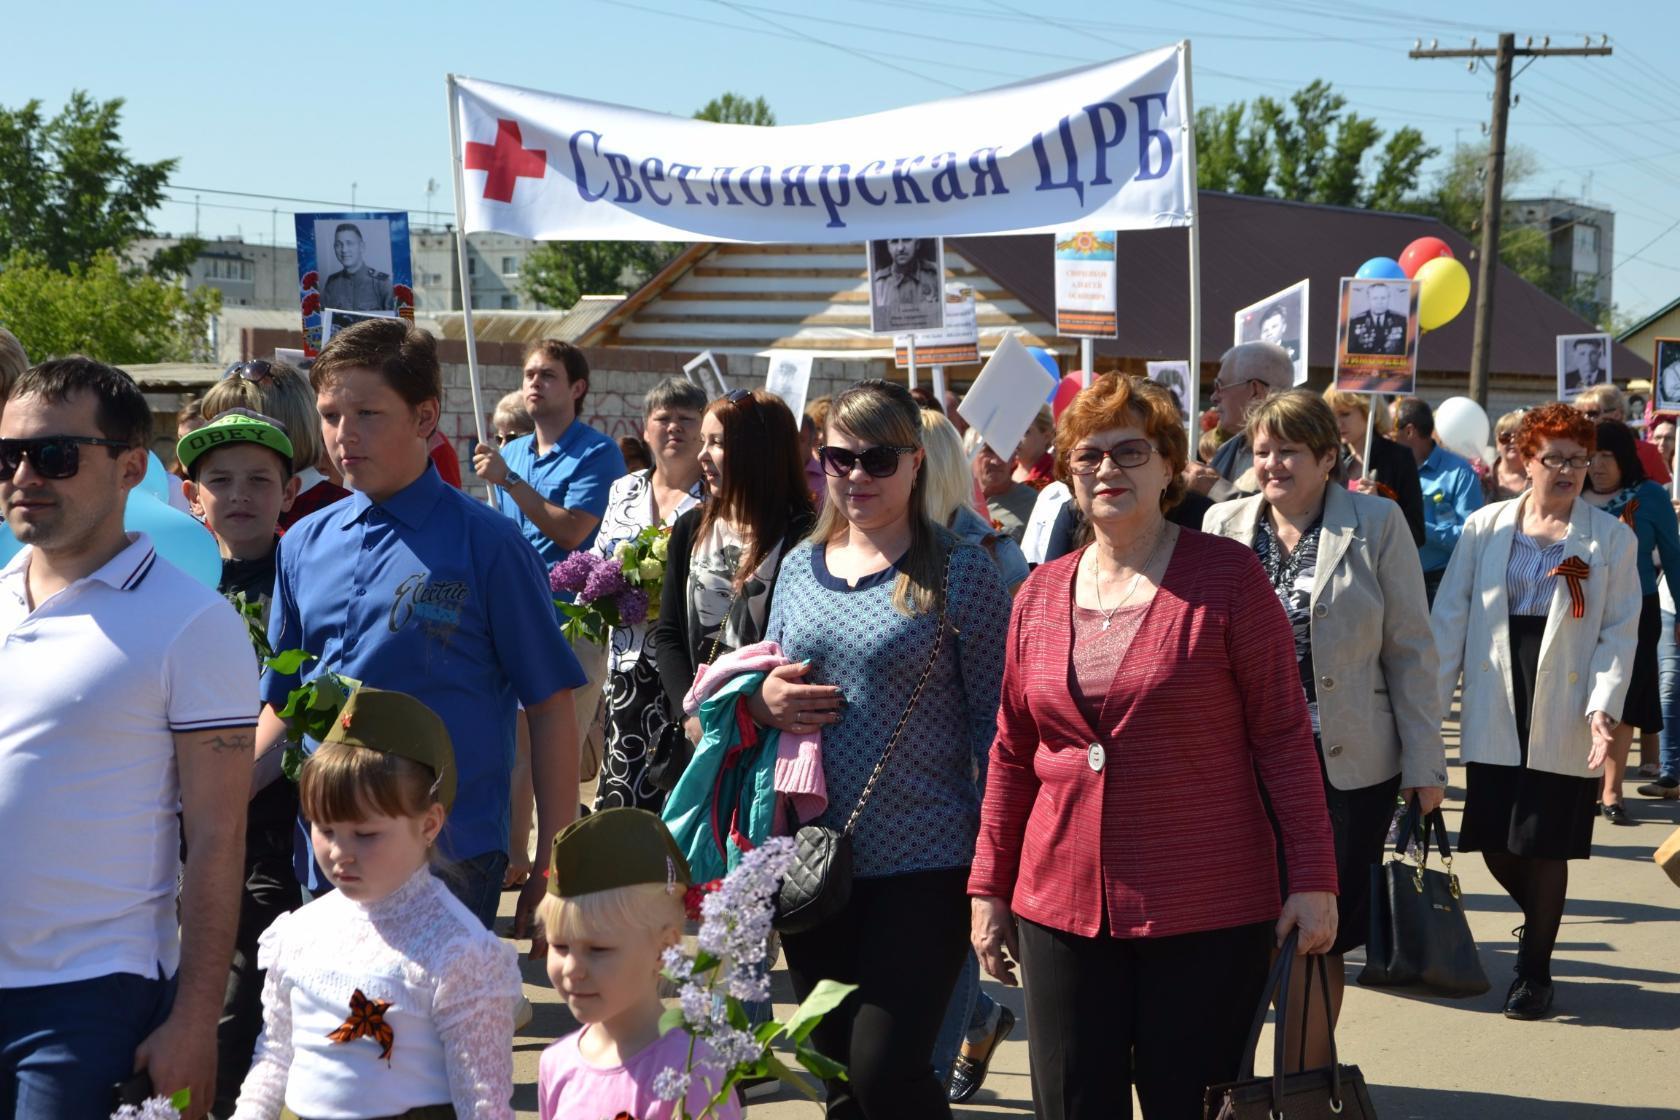 Сотрудники ГБУЗ Светлоярская ЦРБ. 9 мая 2016.